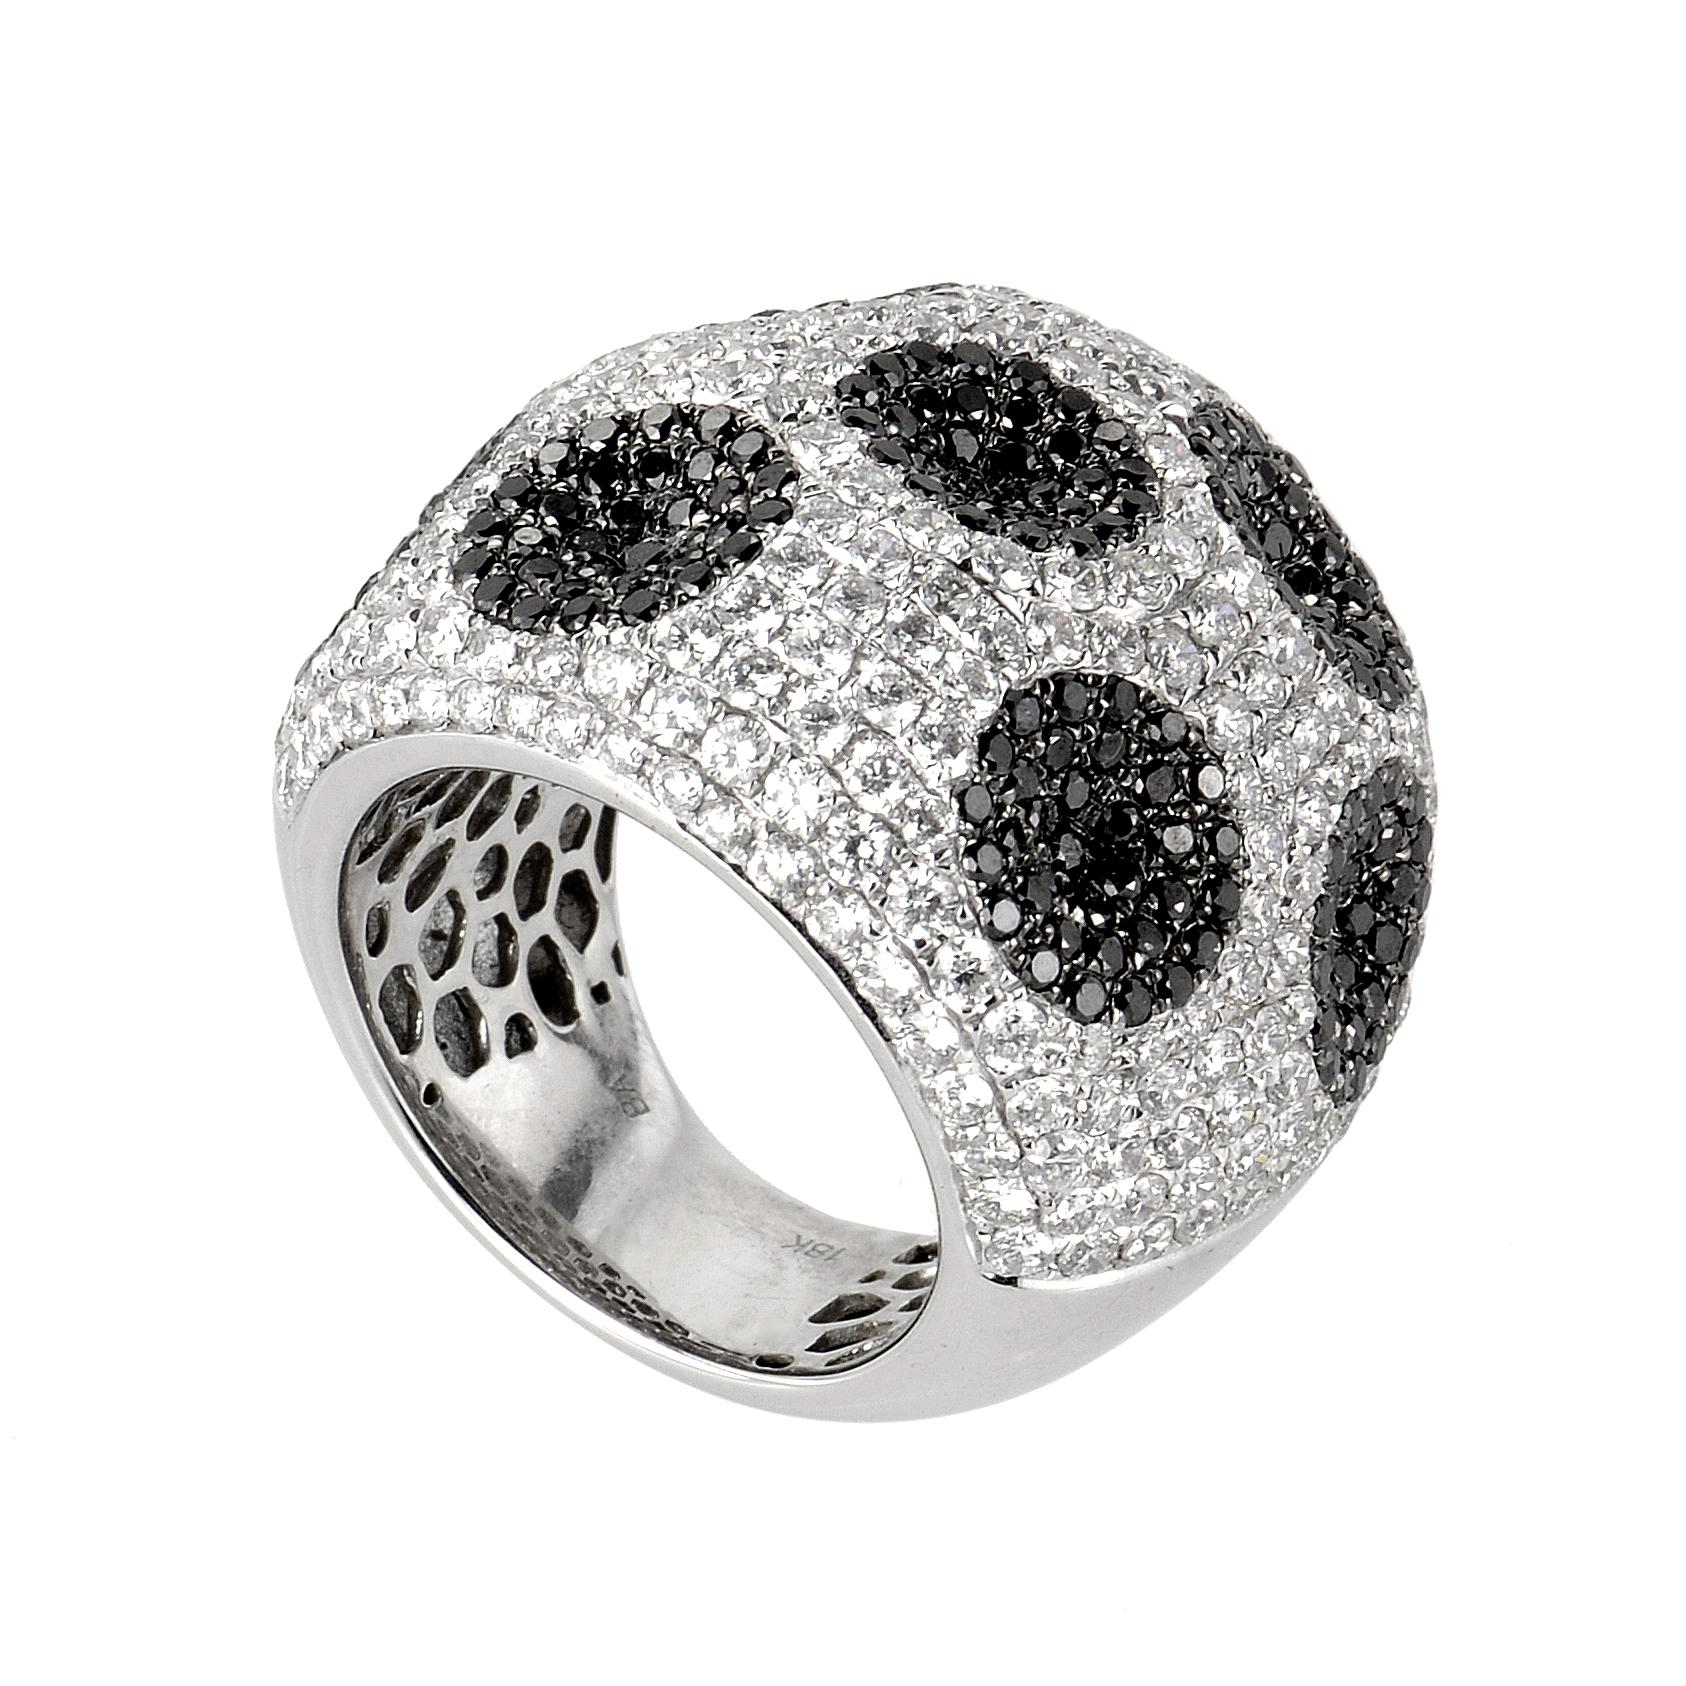 18K White Gold Spotted Diamond Ring